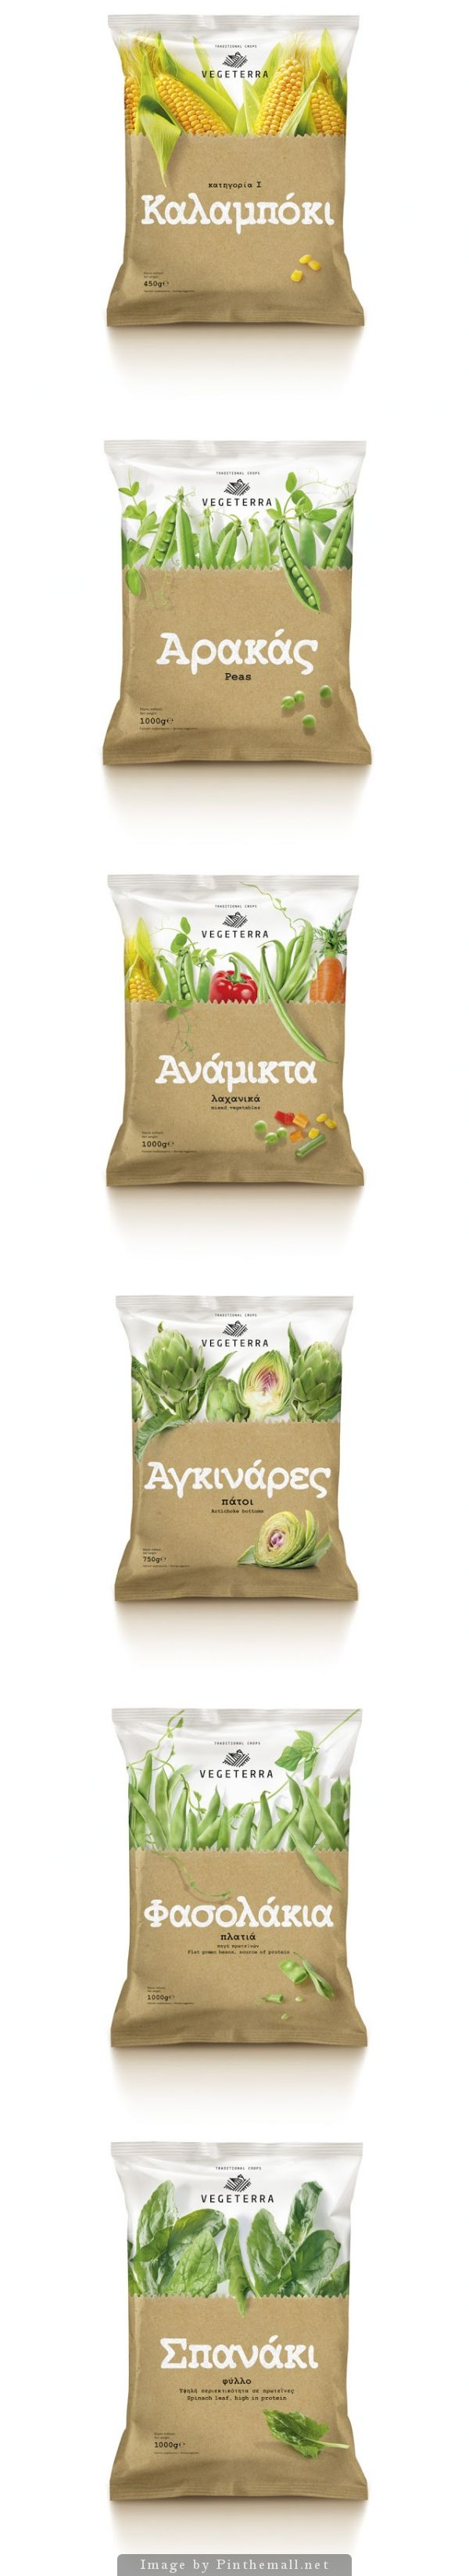 Vegeterra Frozen #Vegetables #packaging by mousegraphics - http://www.packagingoftheworld.com/2014/11/vegeterra-frozen-vegetables.html